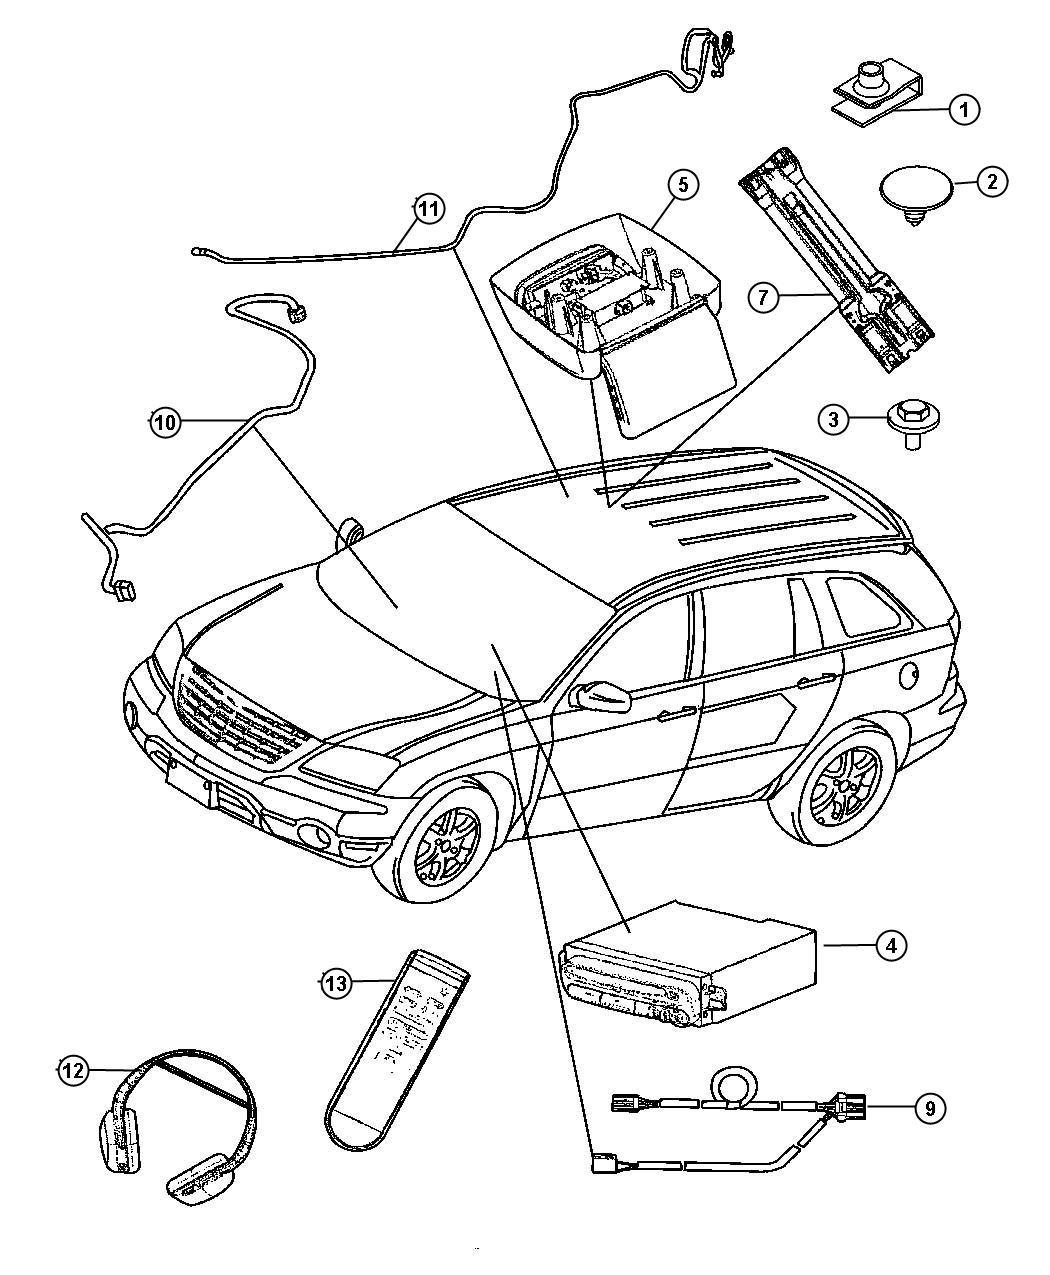 2006 Chrysler Pacifica Latch kit. Video screen. W/ dvd w